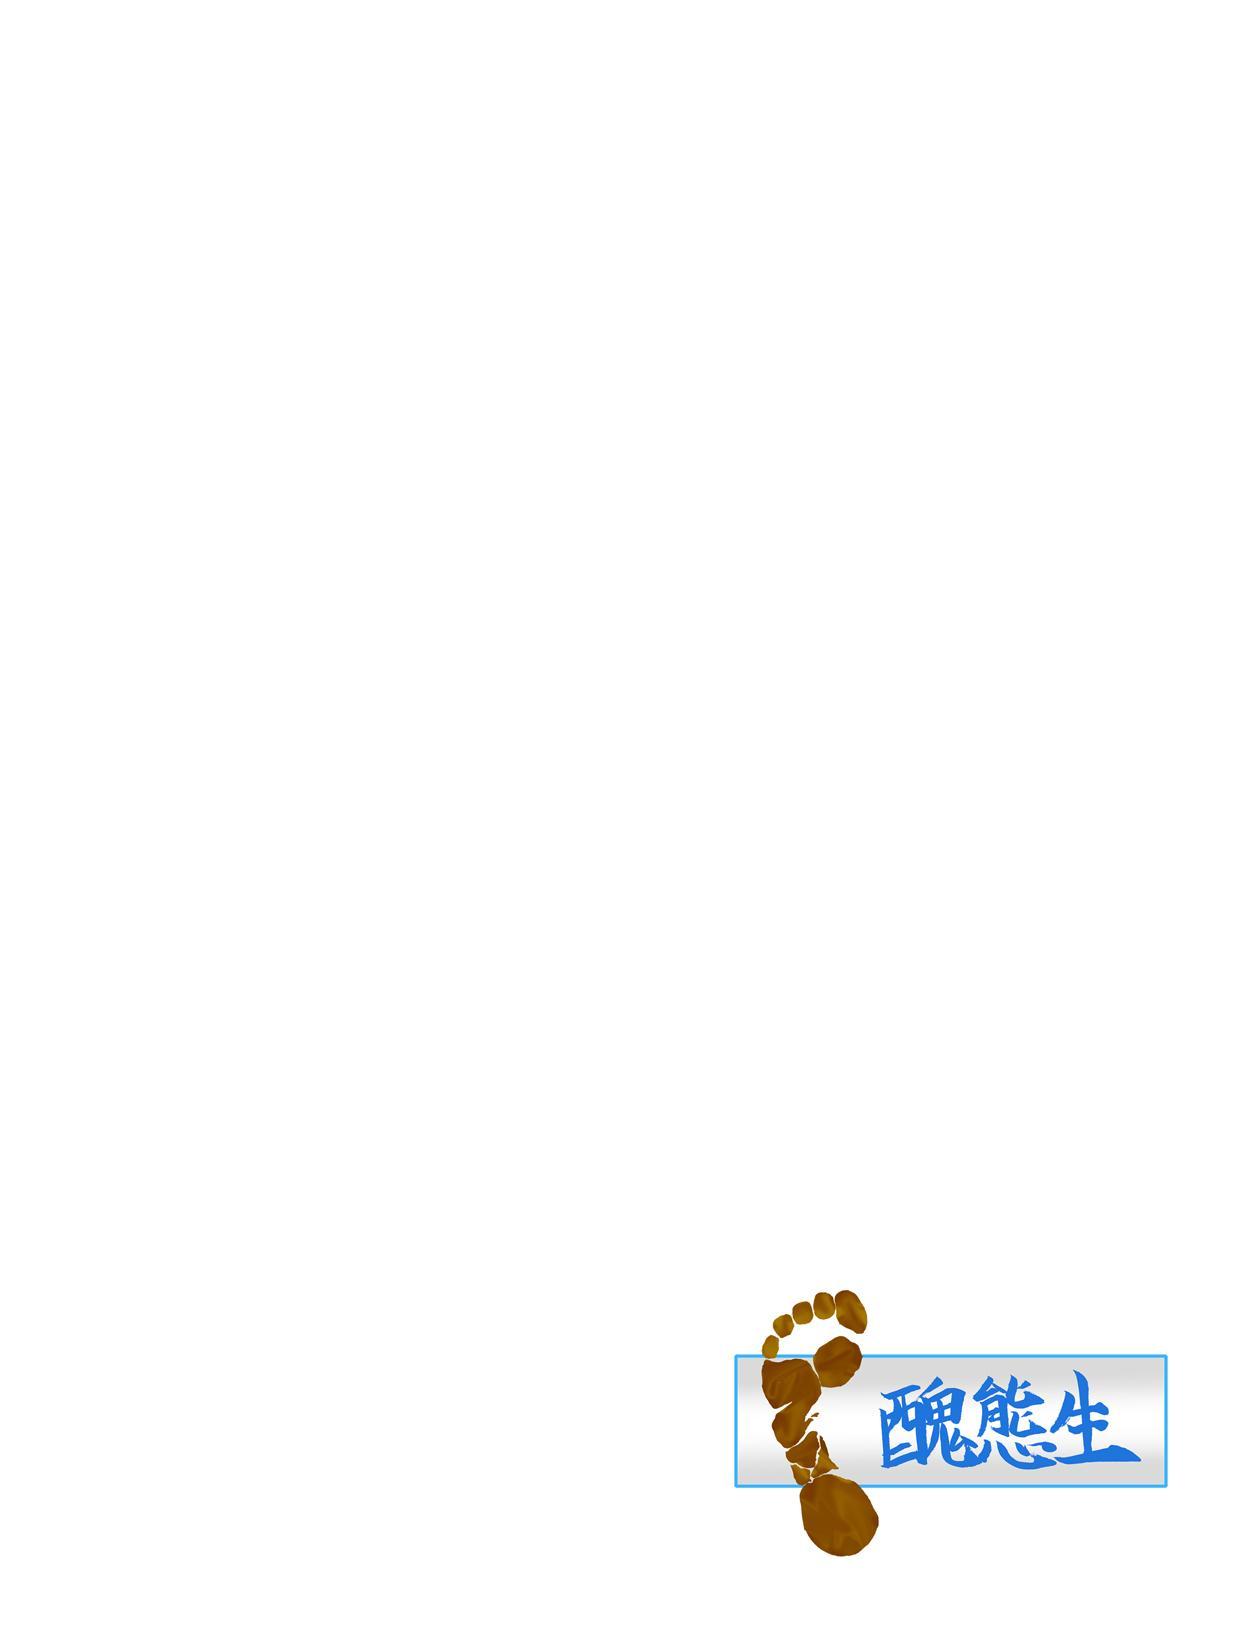 Coach Watashi no Unko Tabetekudasai! | Coach, Please Eat My Poop! 22